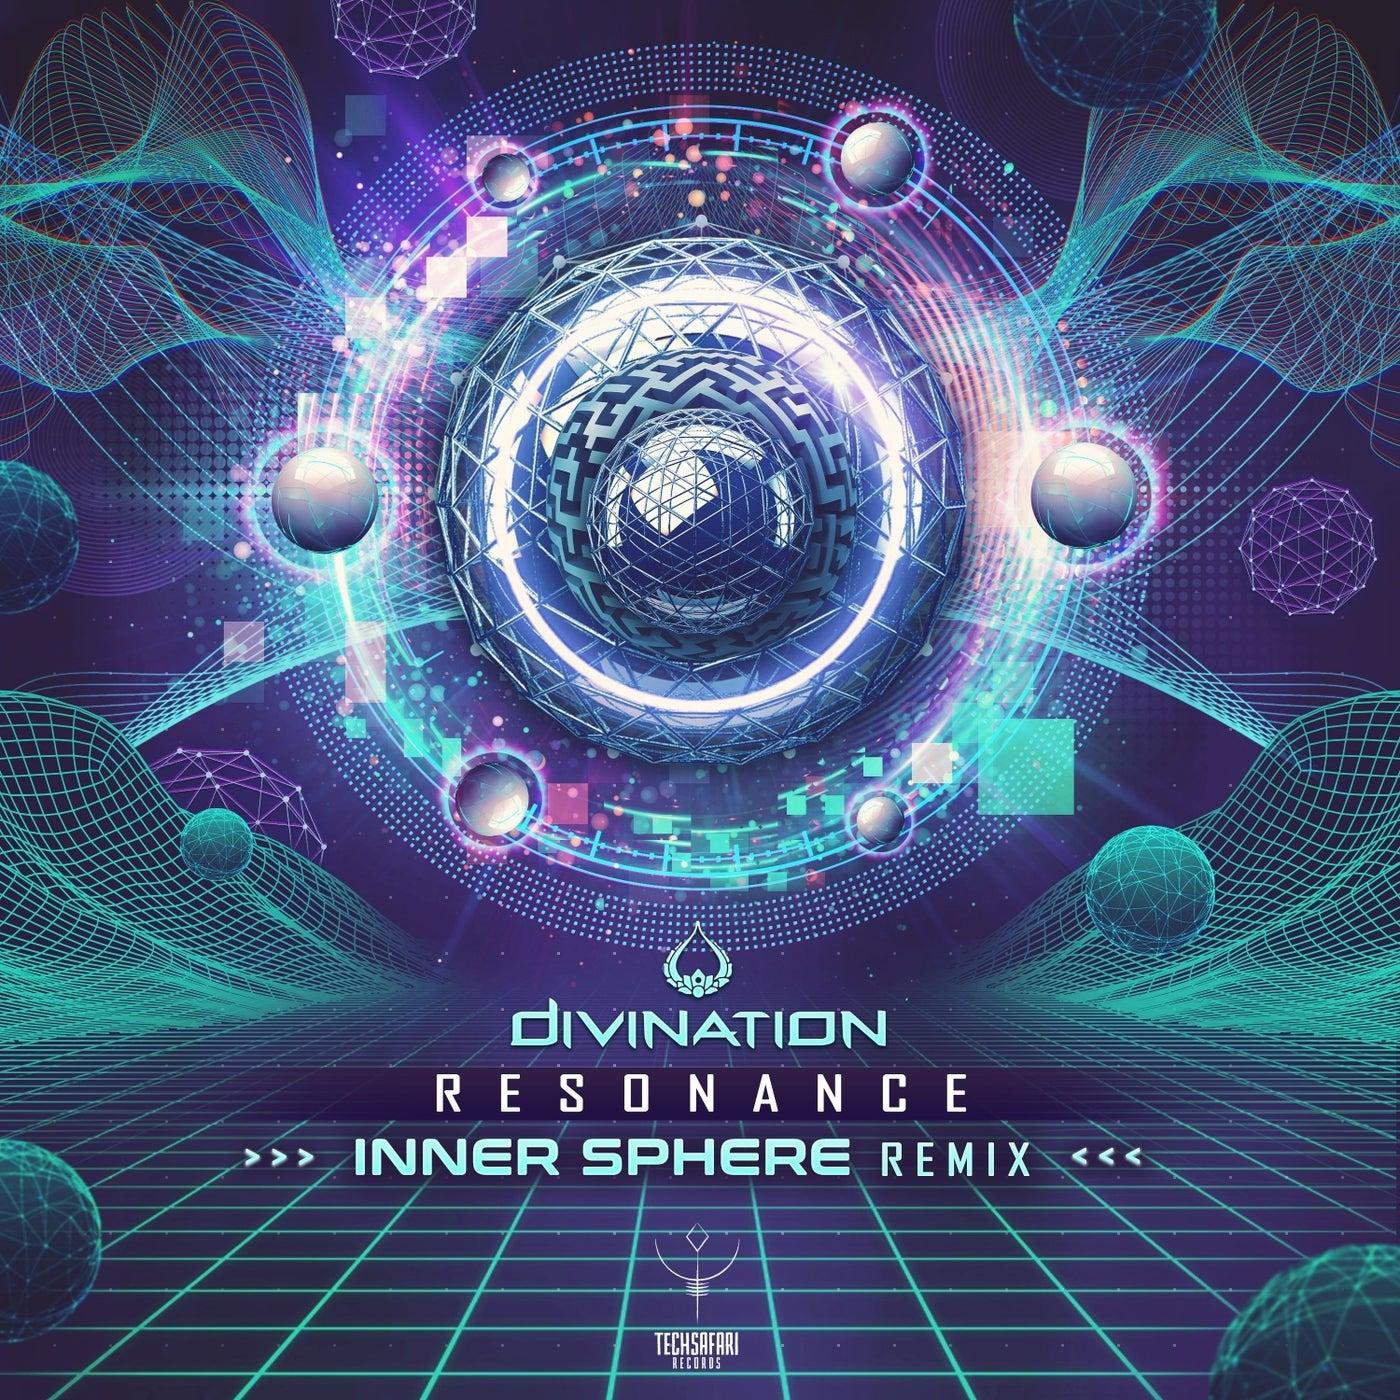 Resonance (Inner Sphere remix)